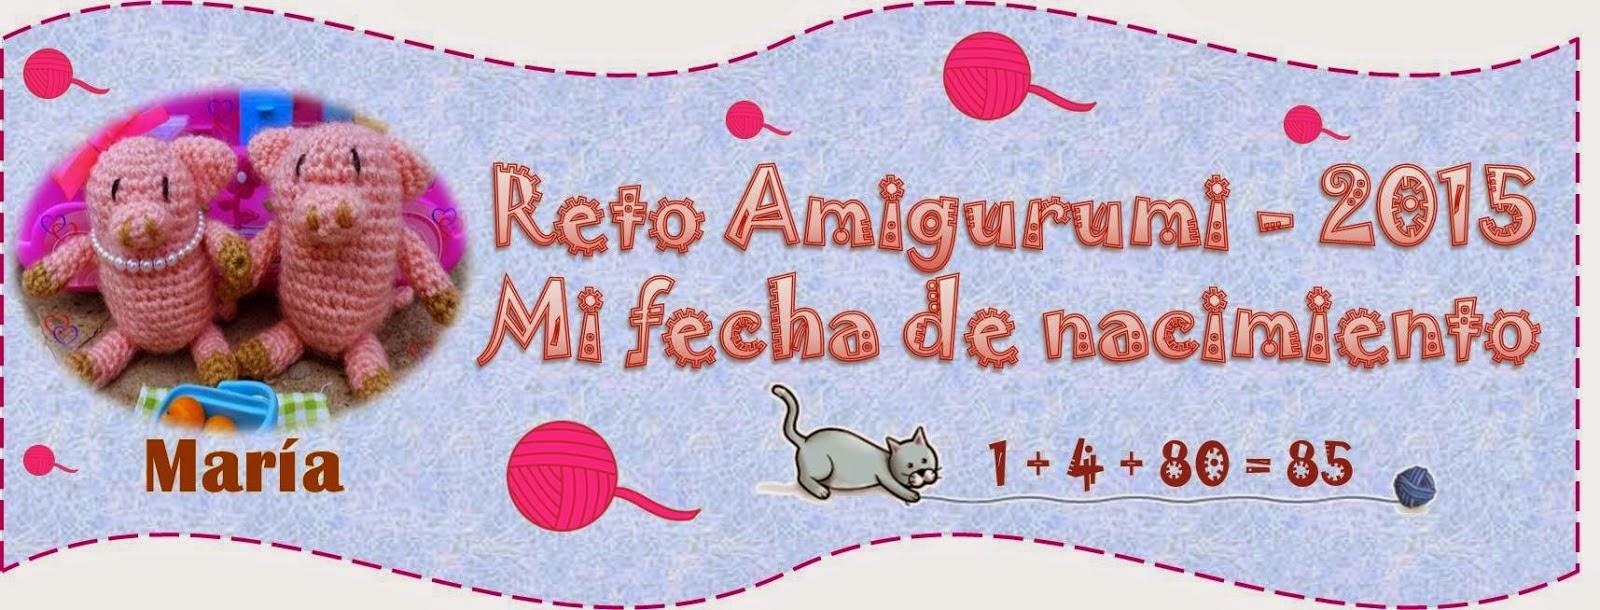 Reto Amigurumi 2015